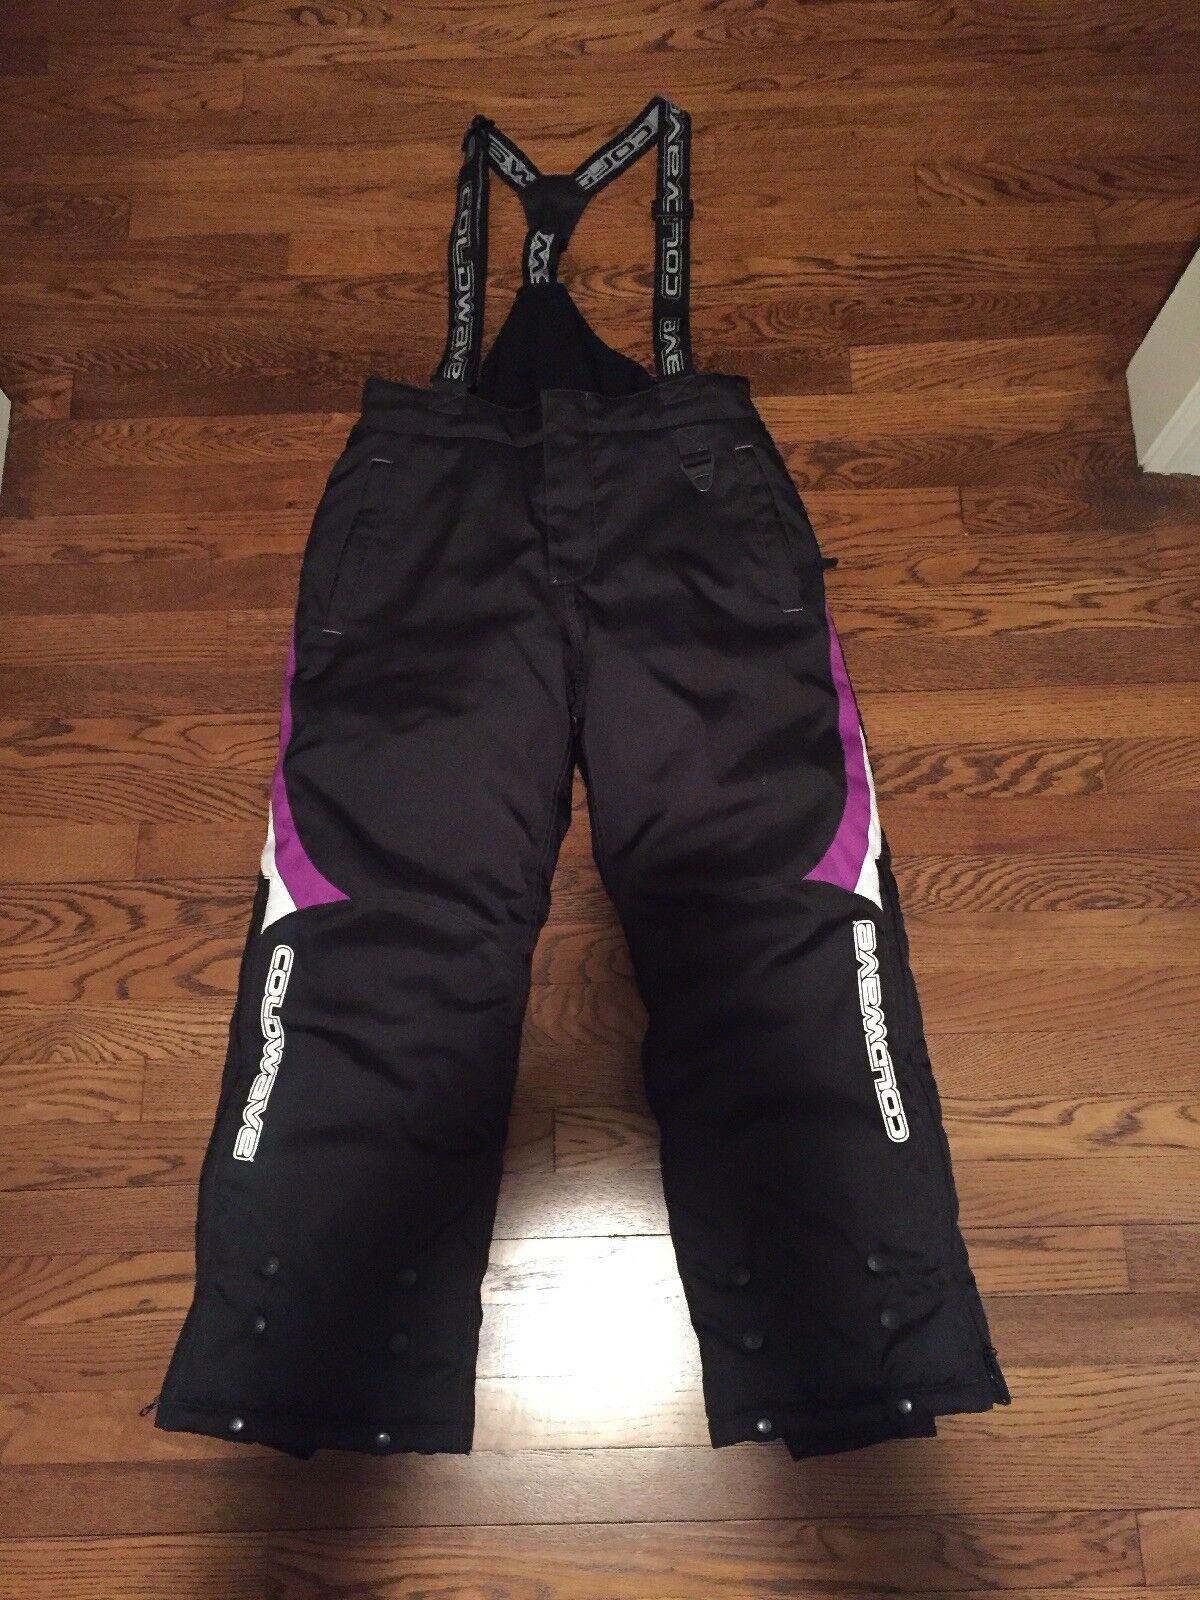 NWOT Coldwave womens size 8 Ski Pants Bibs